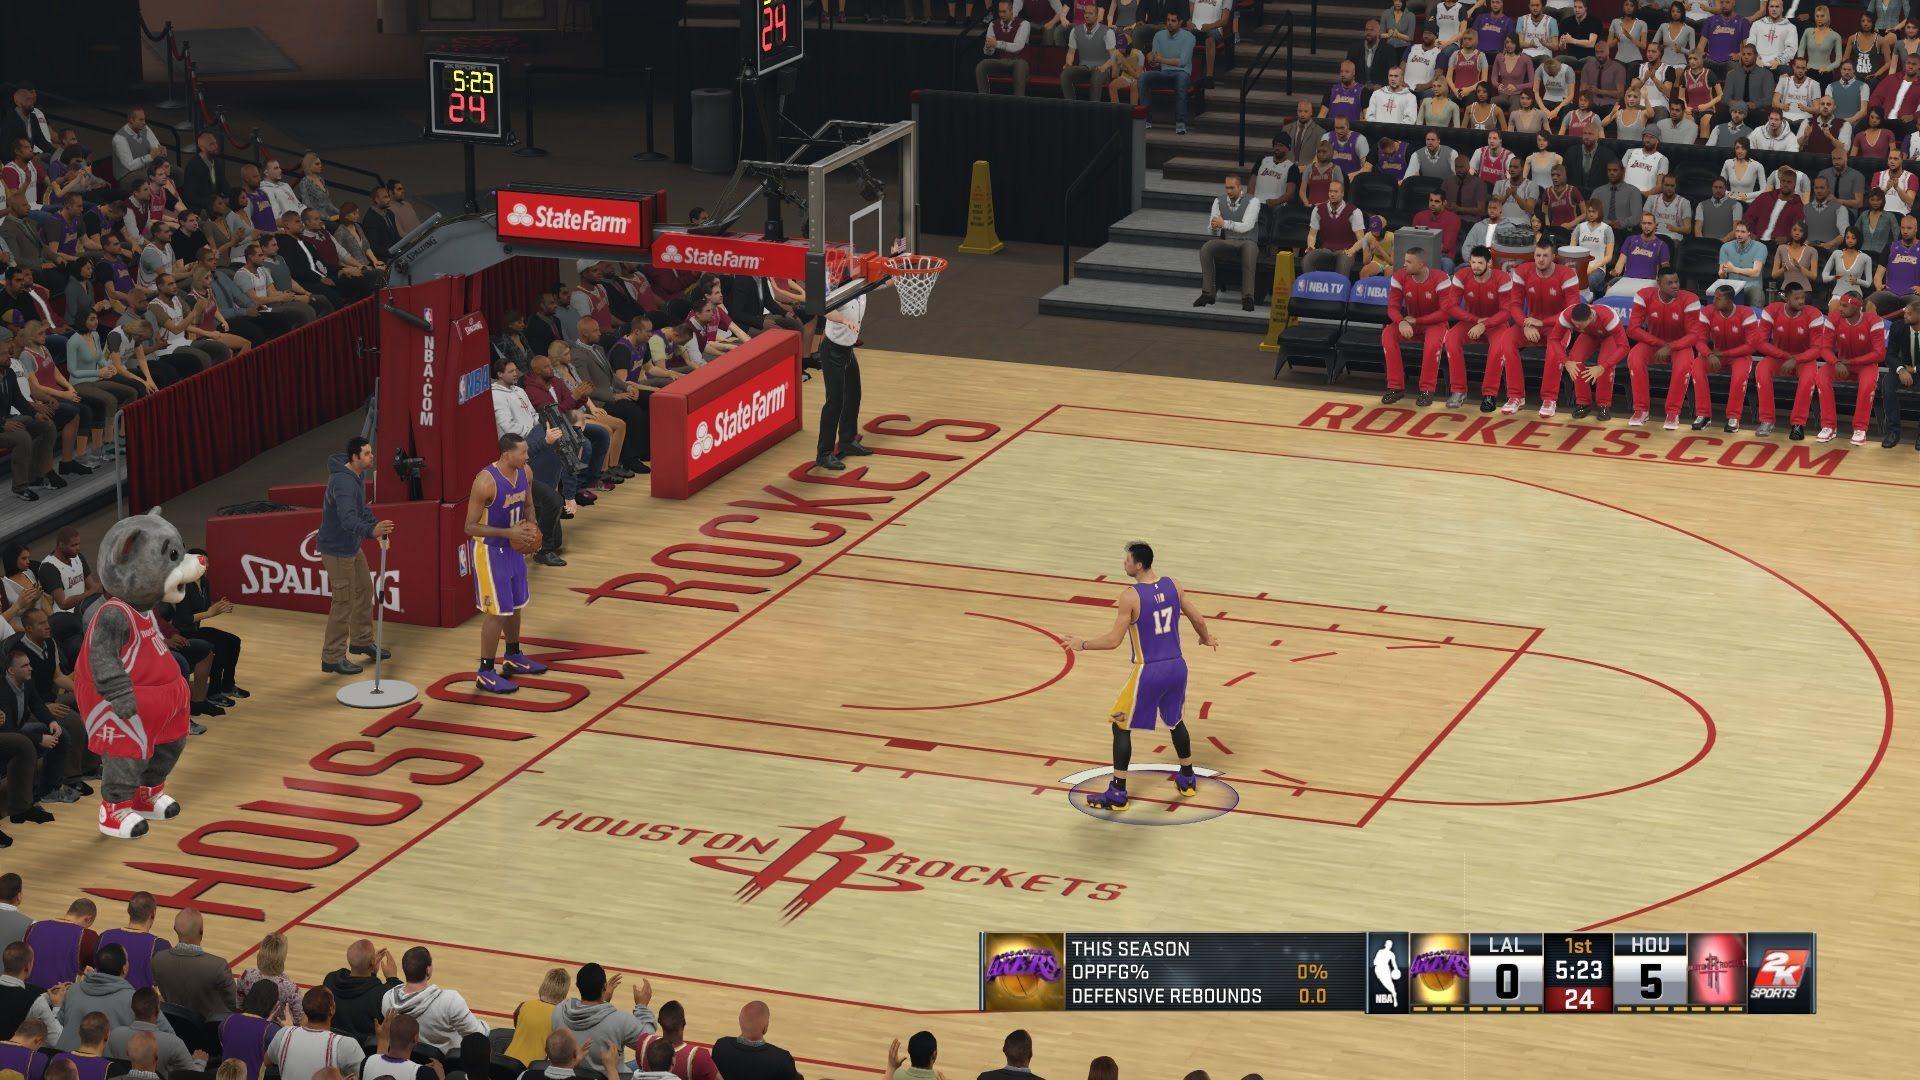 NBA 2K16 image #2